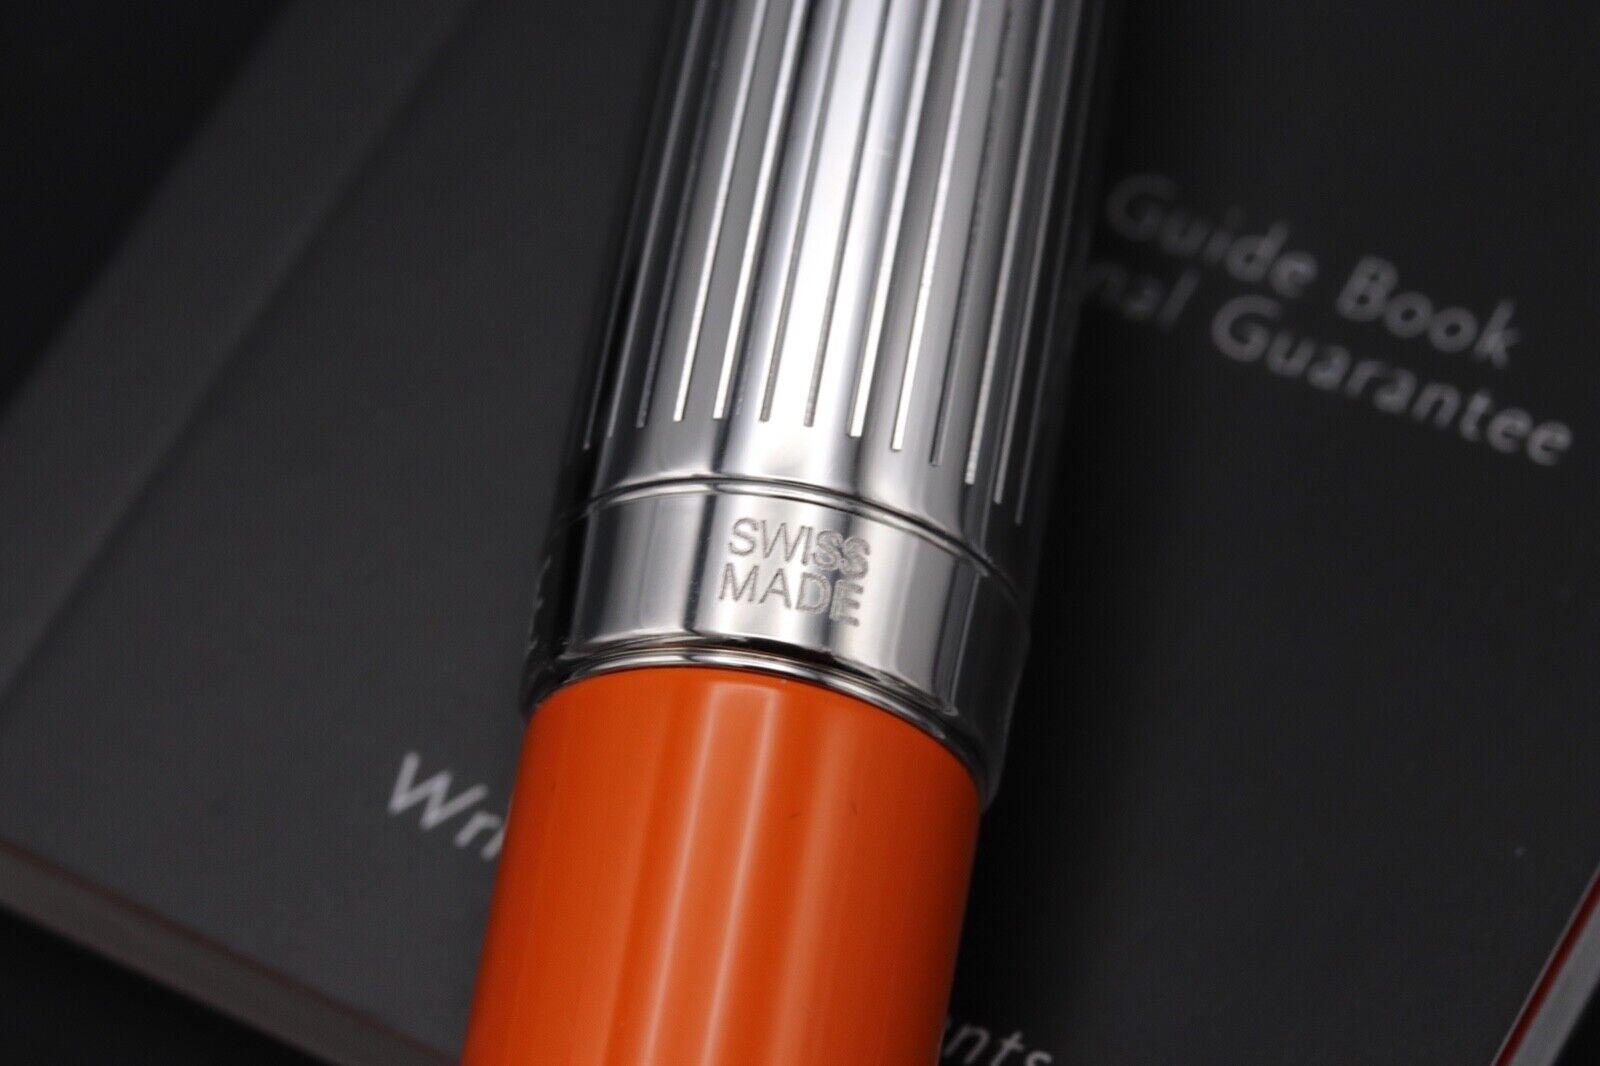 Caran d'Ache Leman Bicolor Saffron Fountain Pen 5